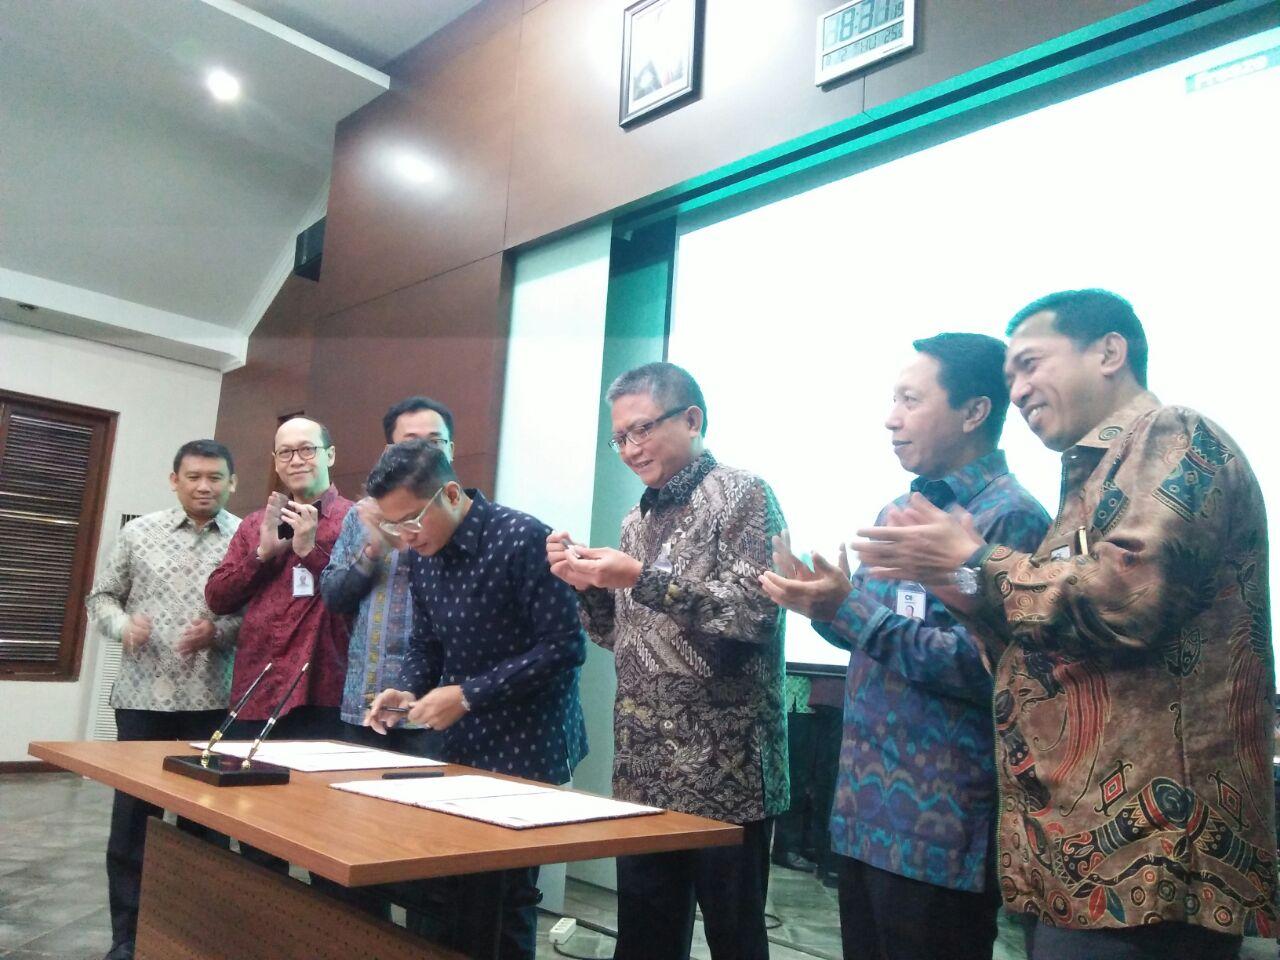 https: img.okezone.com content 2018 08 02 278 1930818 askrindo-jamin-sekuritisasi-aset-garuda-indonesia-rp2-triliun-e1aFXF03cS.jpg